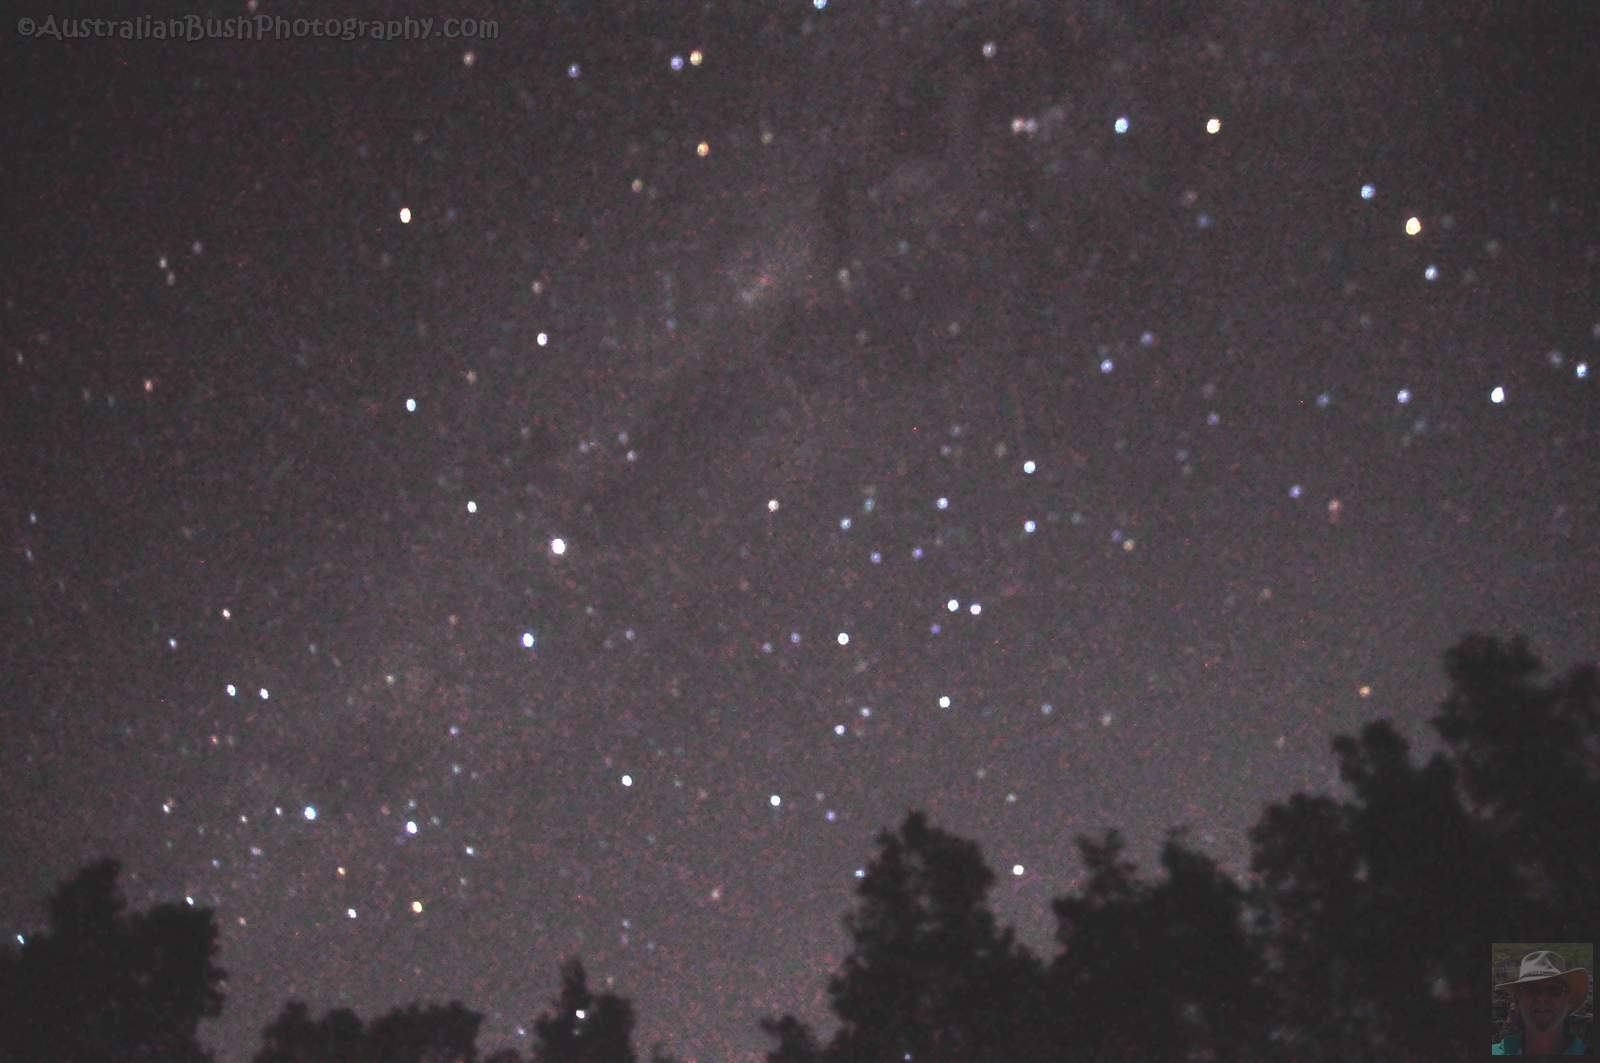 Night Sky over Boydtown